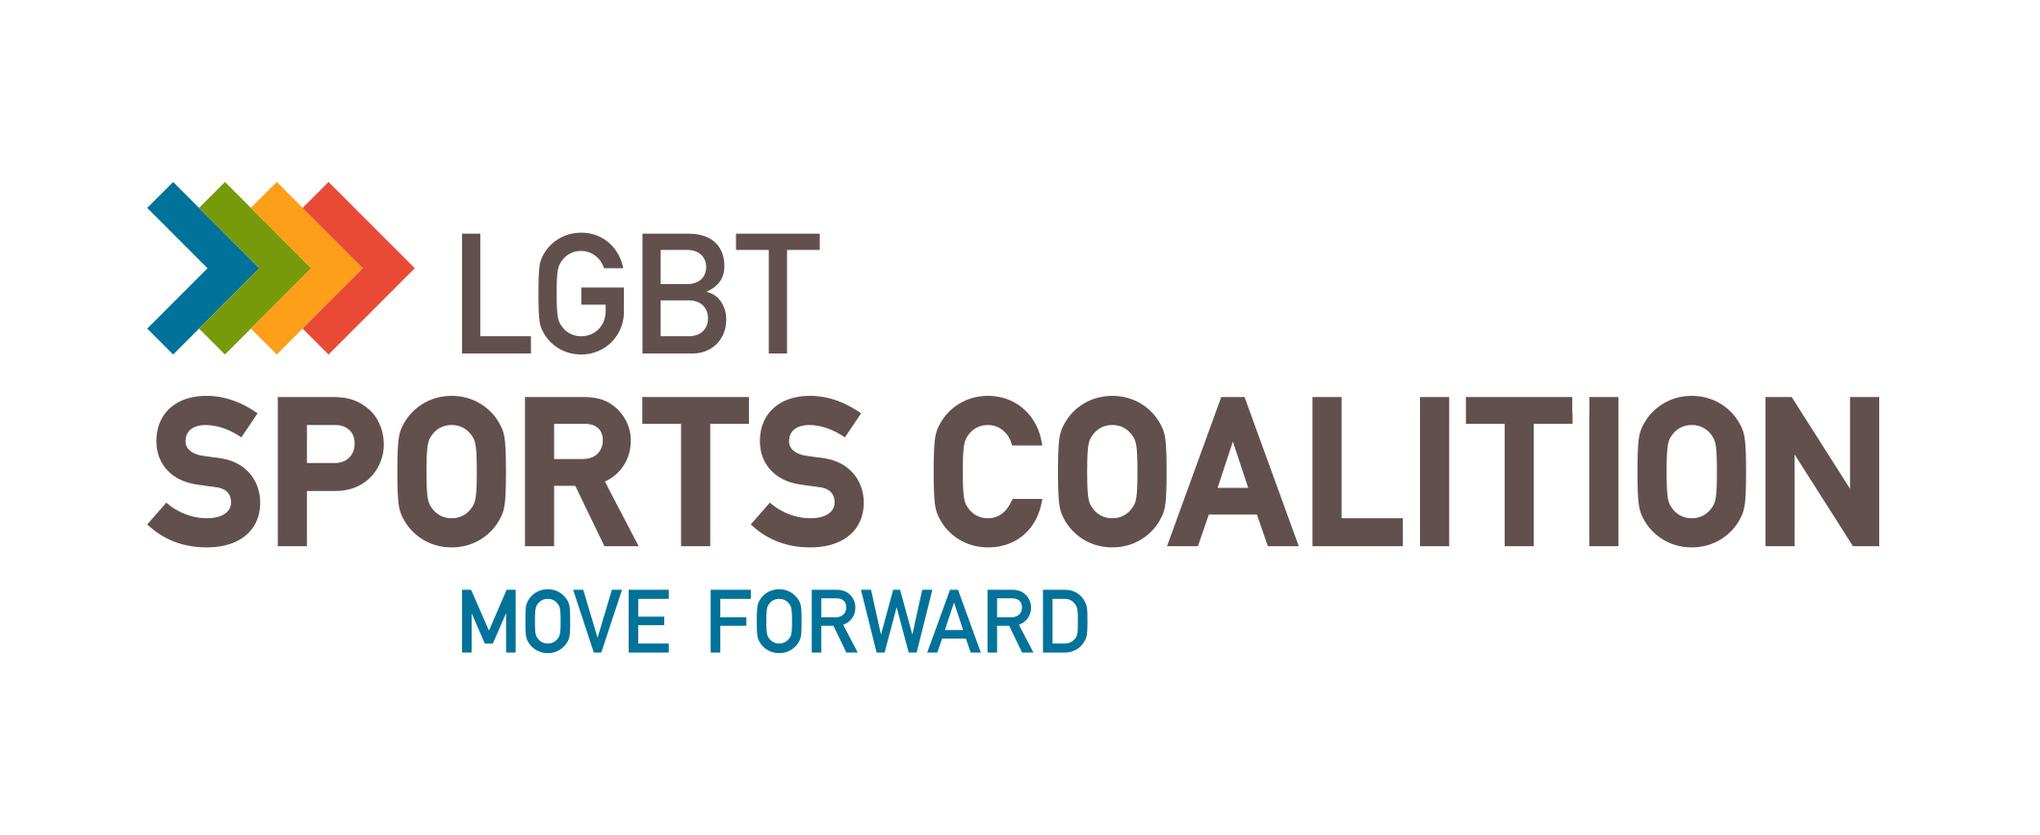 gay lesbian rainbow coalition